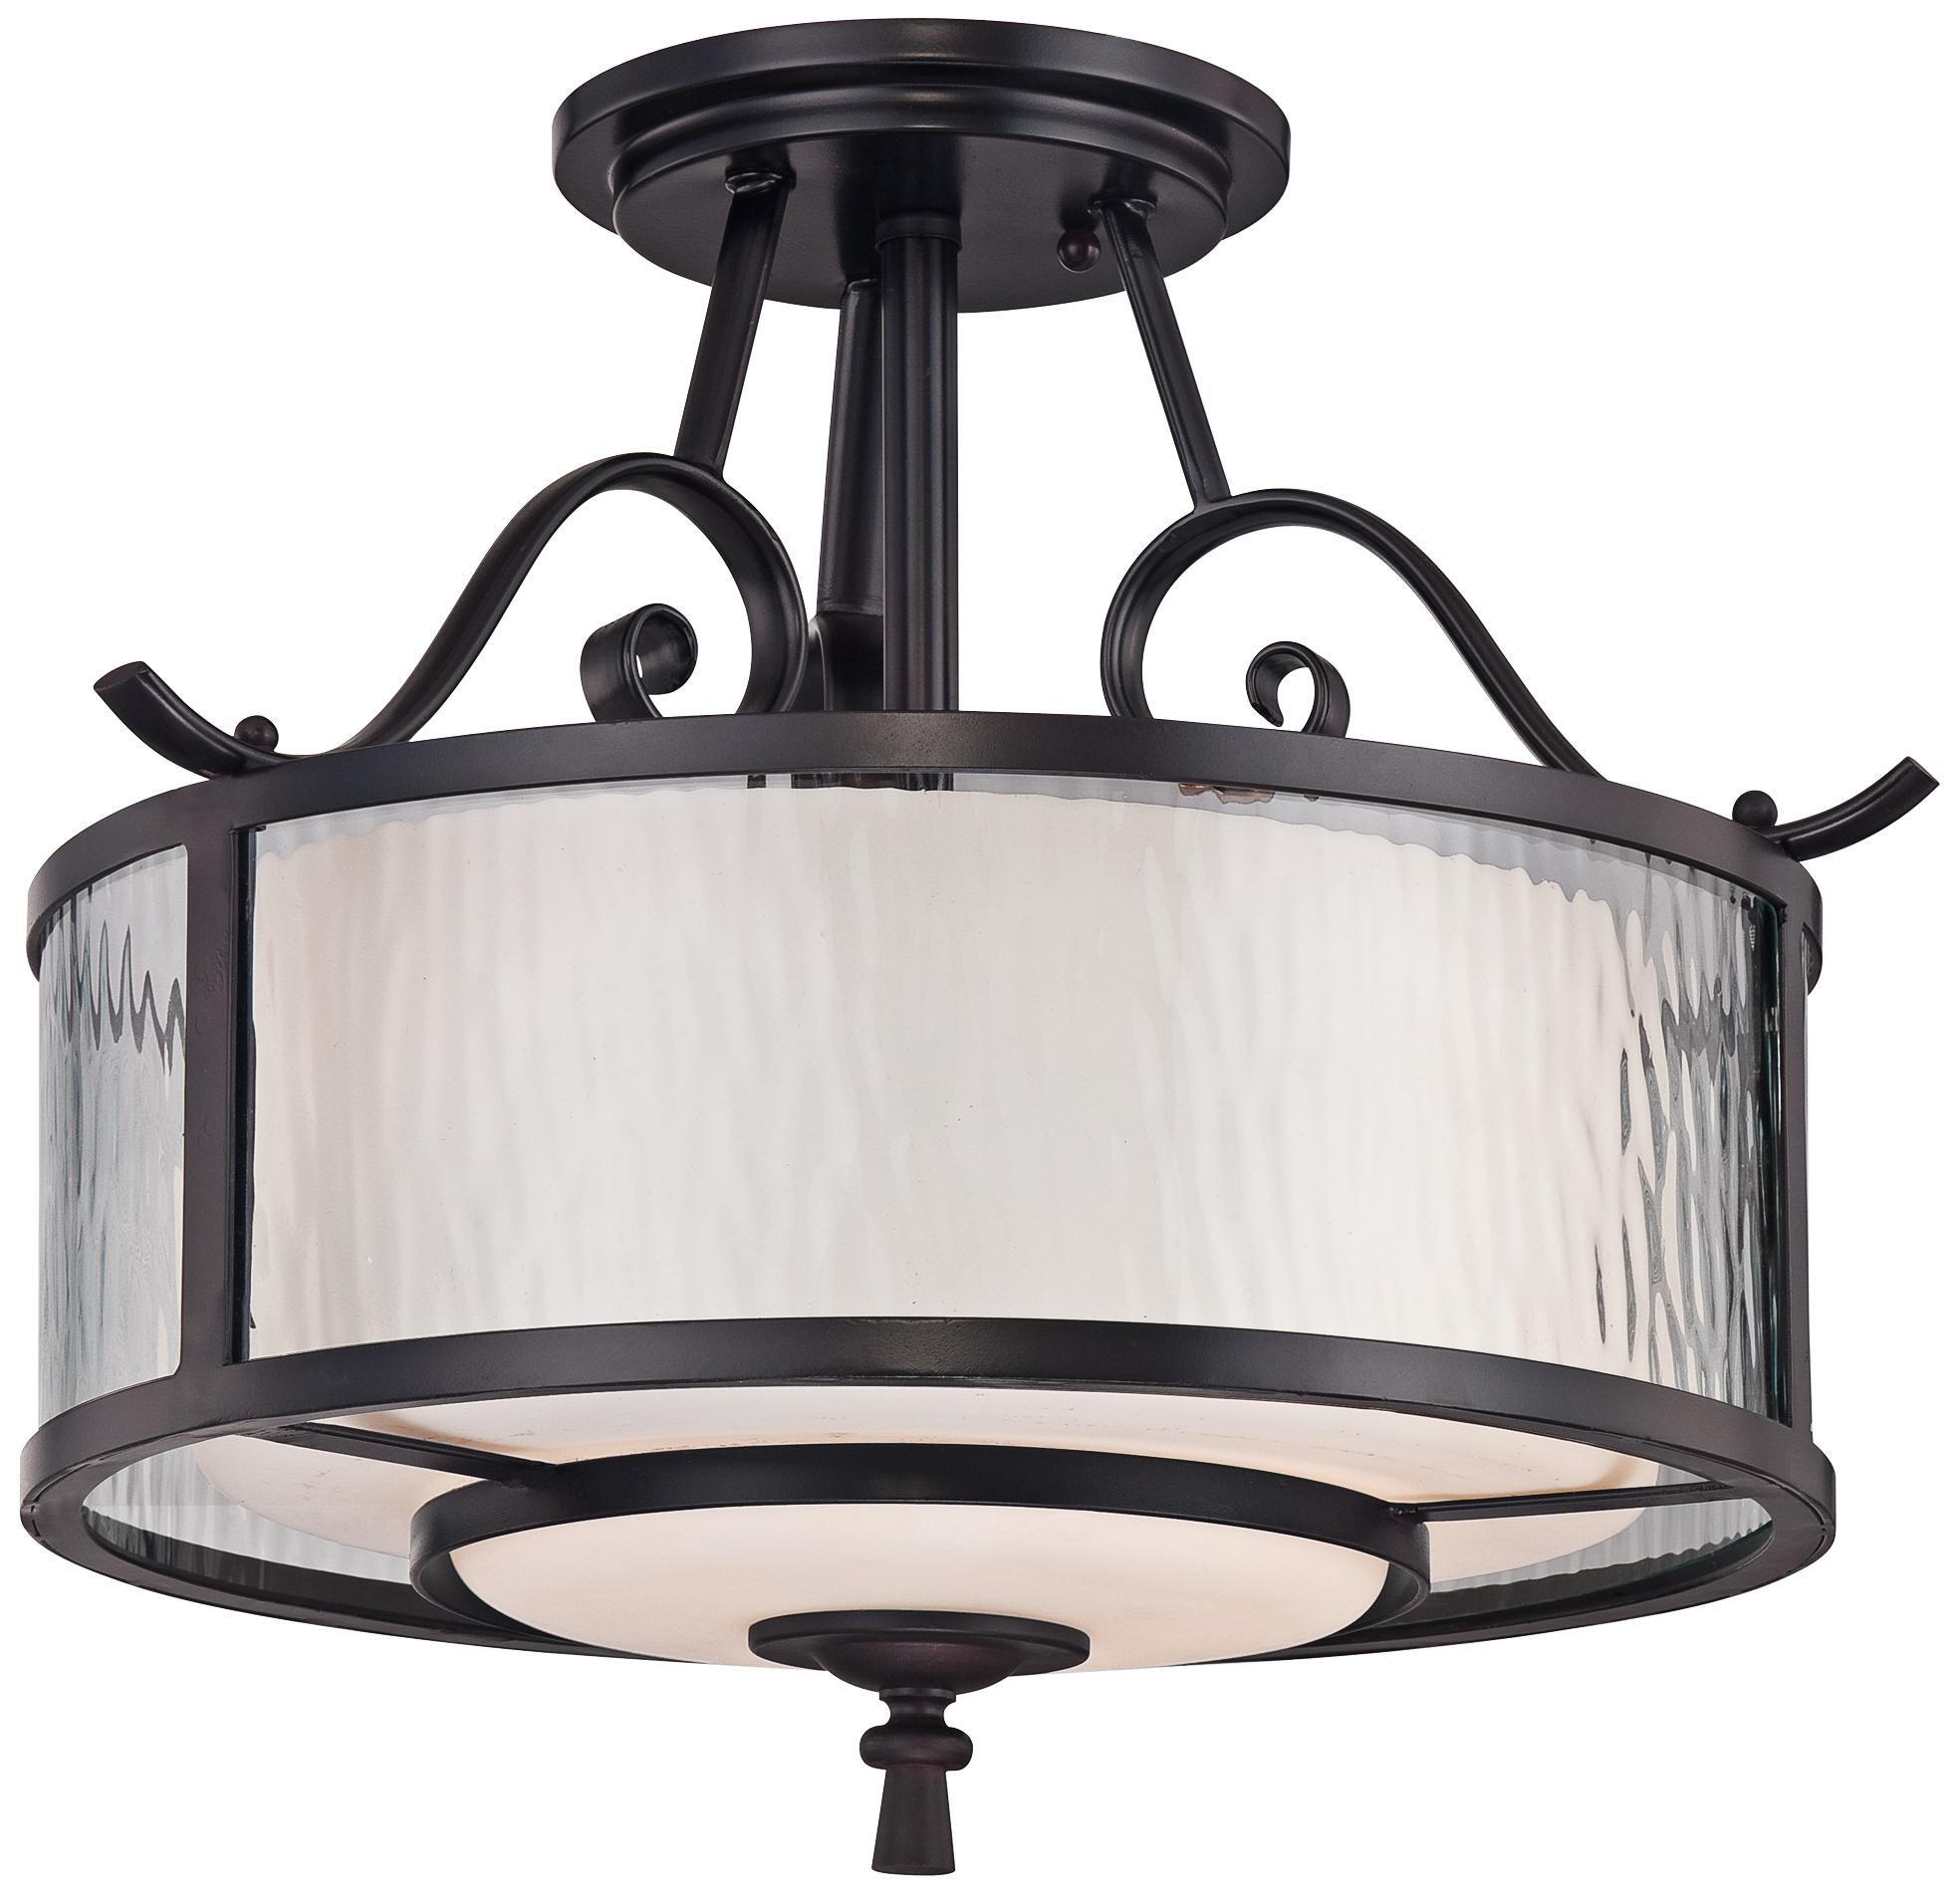 350 91 Adonis 15 Wide Semi Flushmount Quoizel Ceiling Light